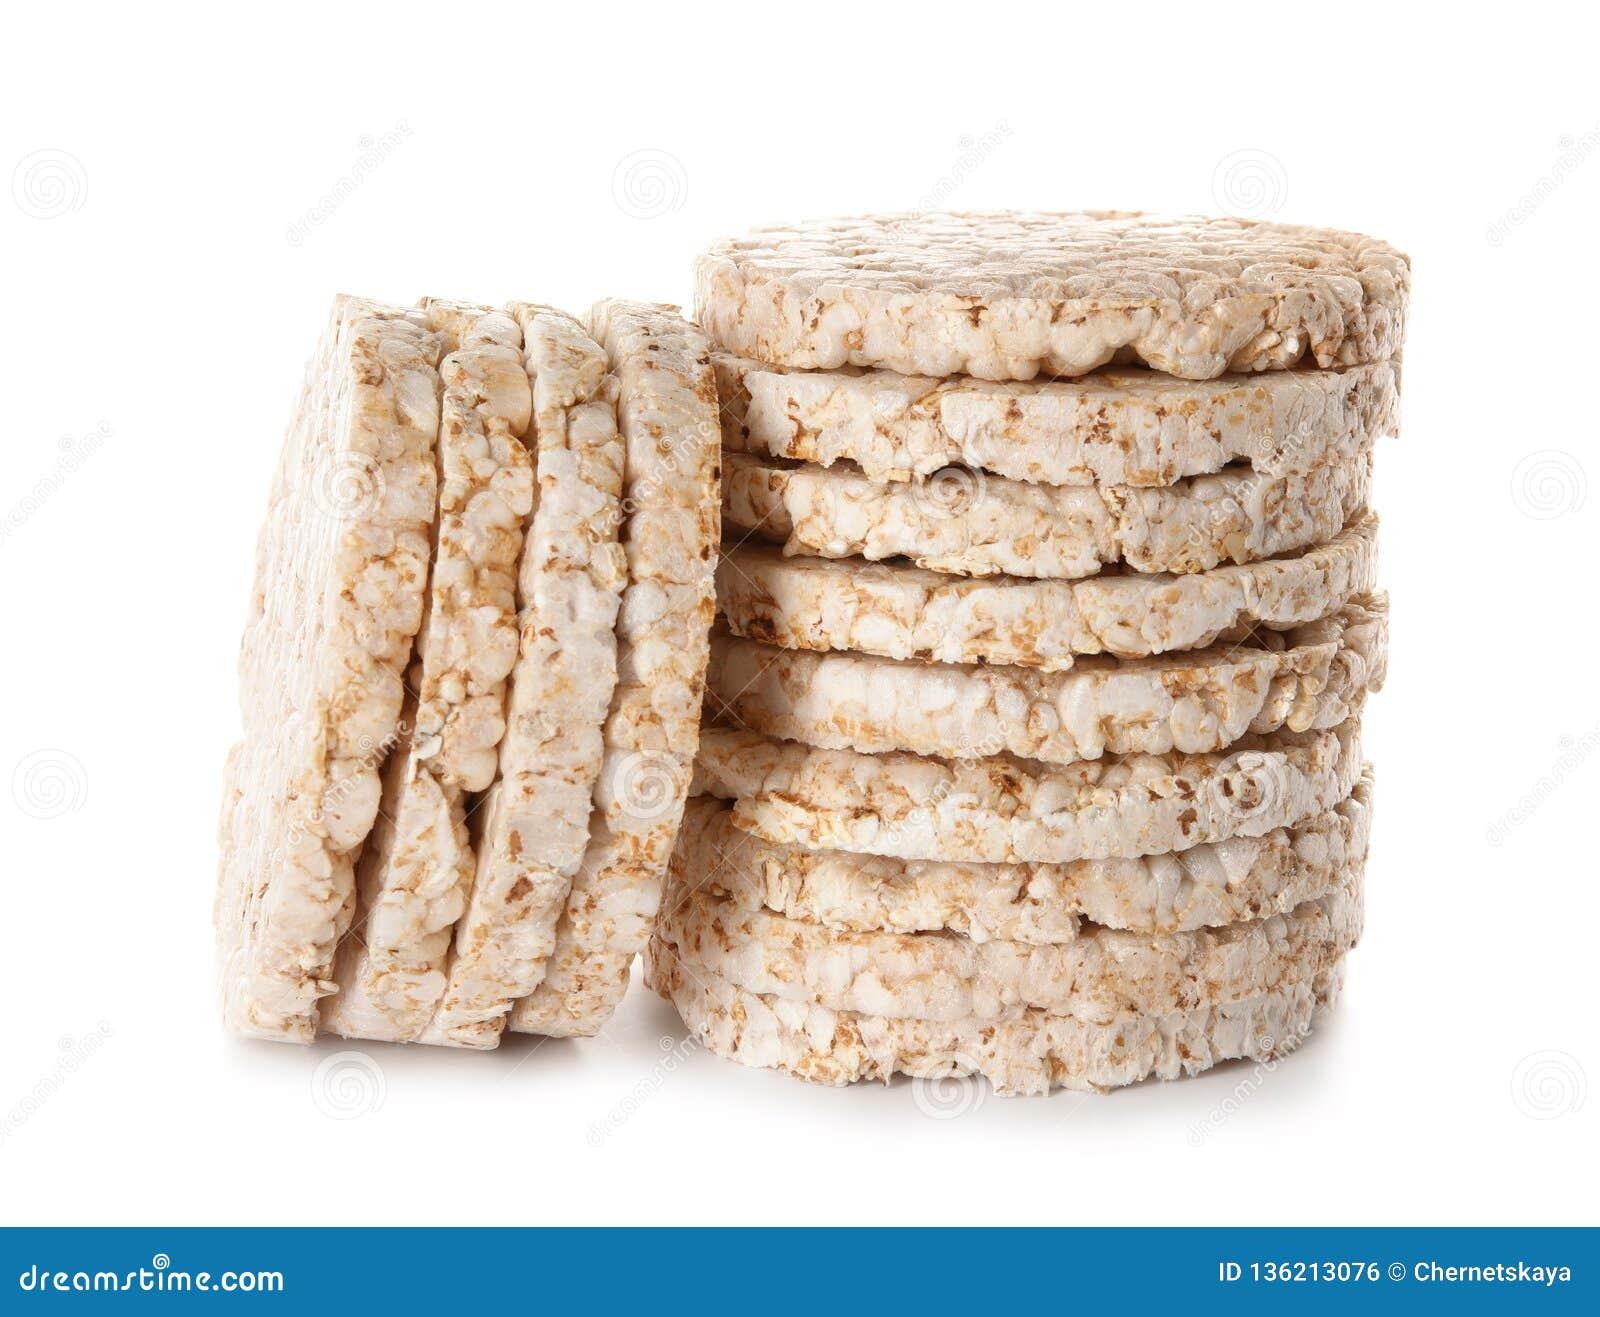 Crunchy rice cakes on white background.